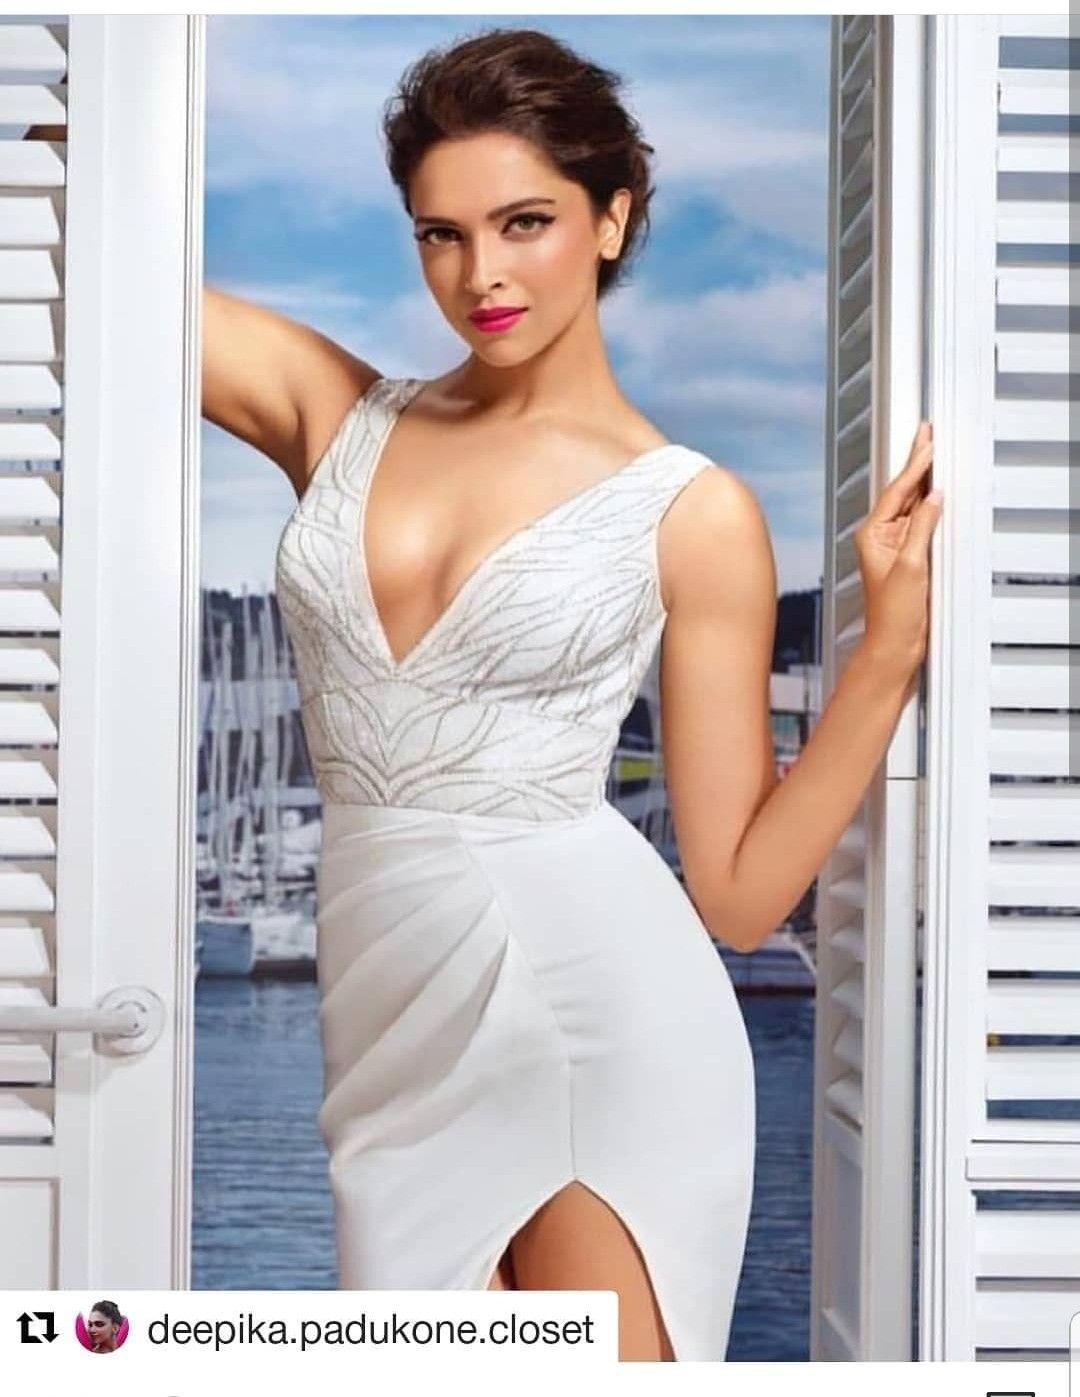 Romanian amateur posing sexy